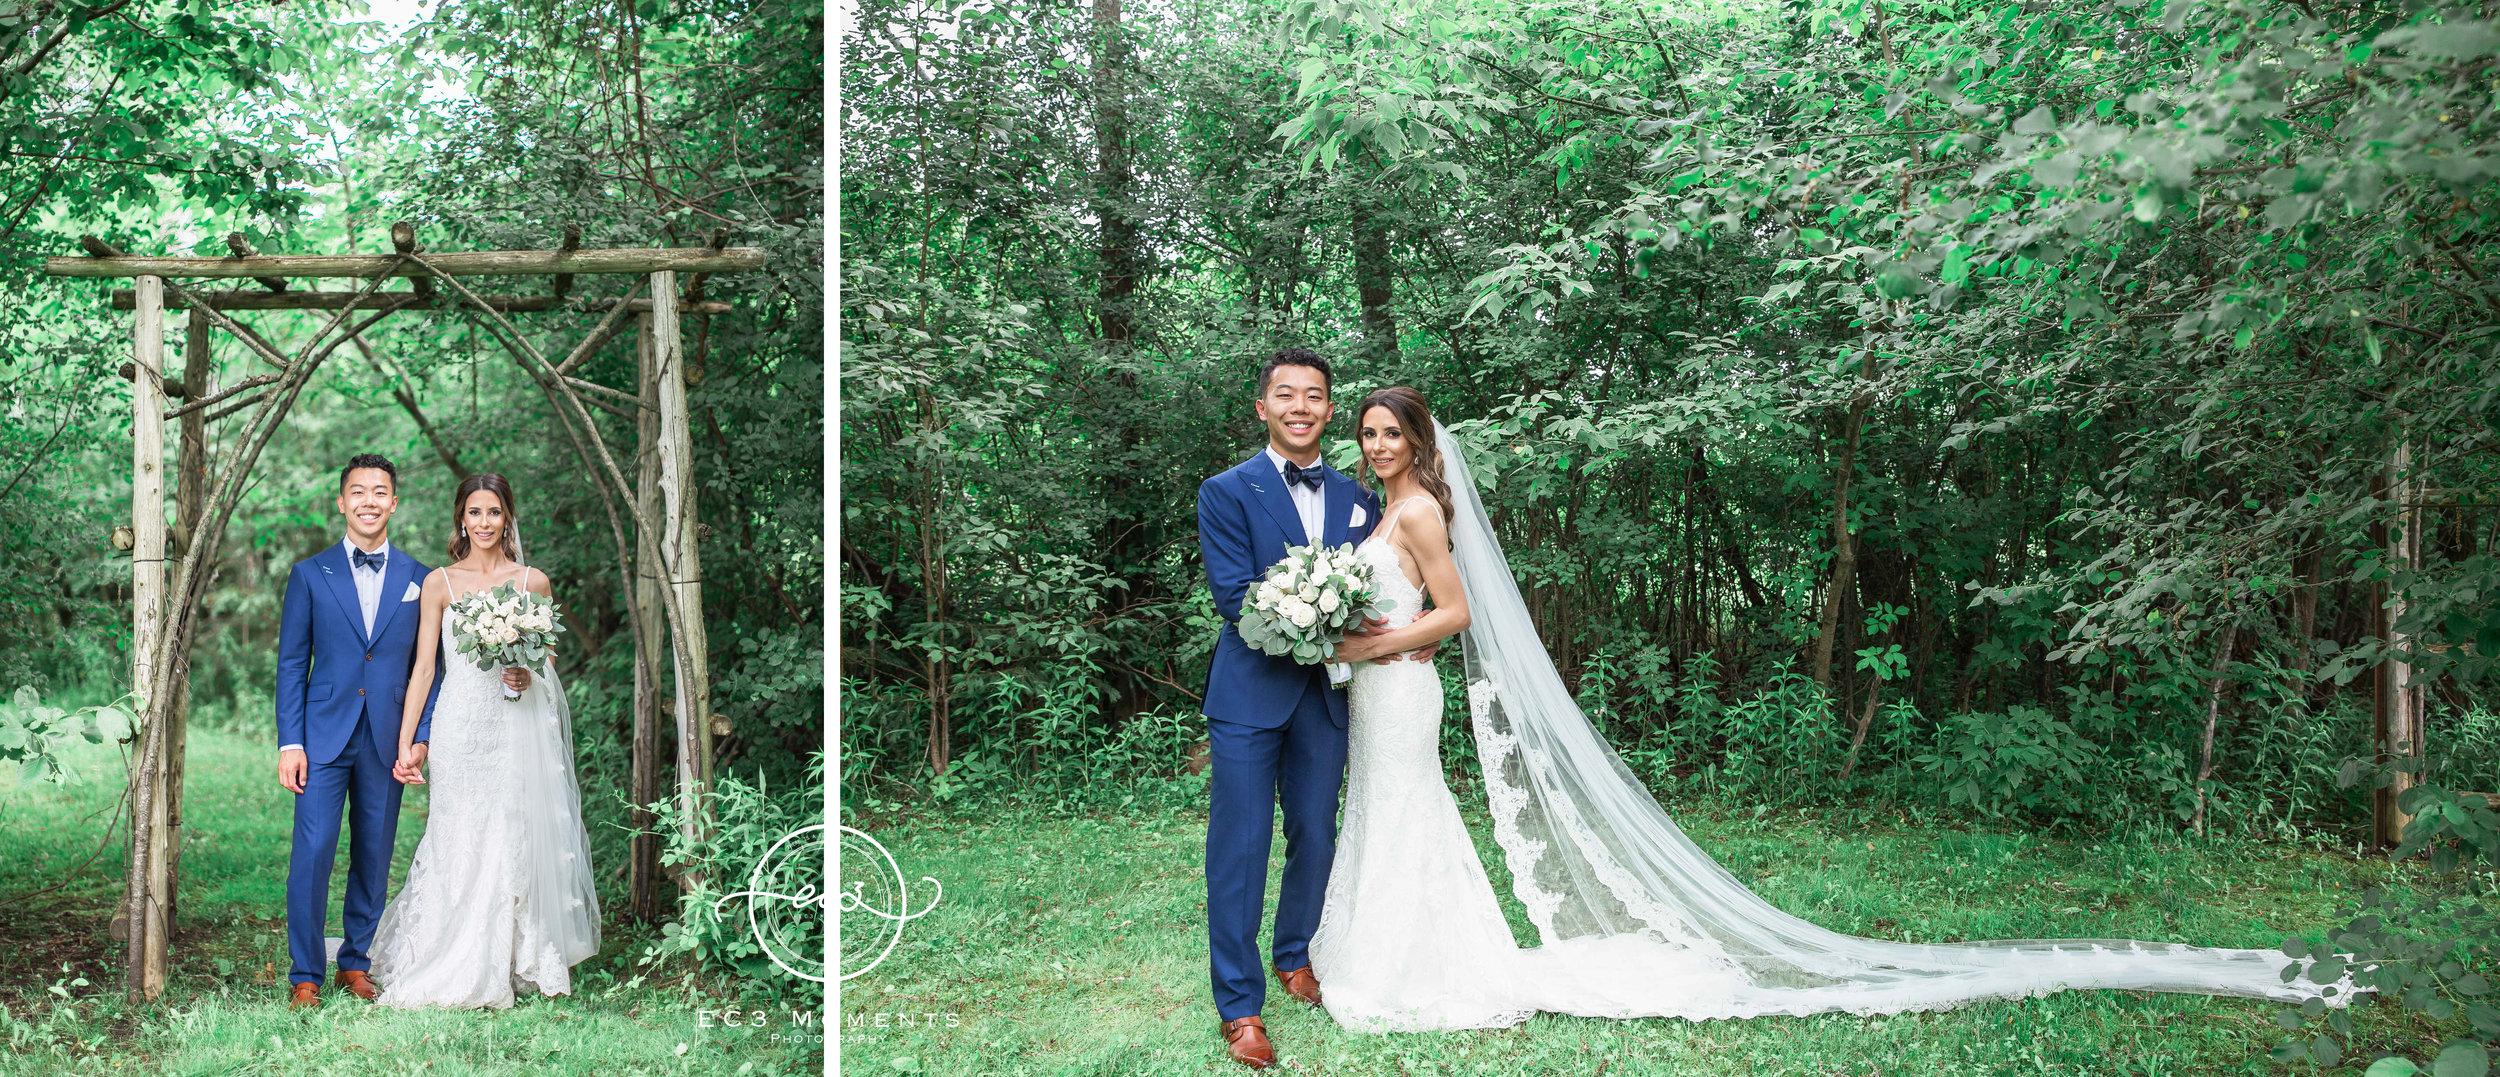 Laura & Ryan Holland Marsh Wineries Wedding 28.jpg